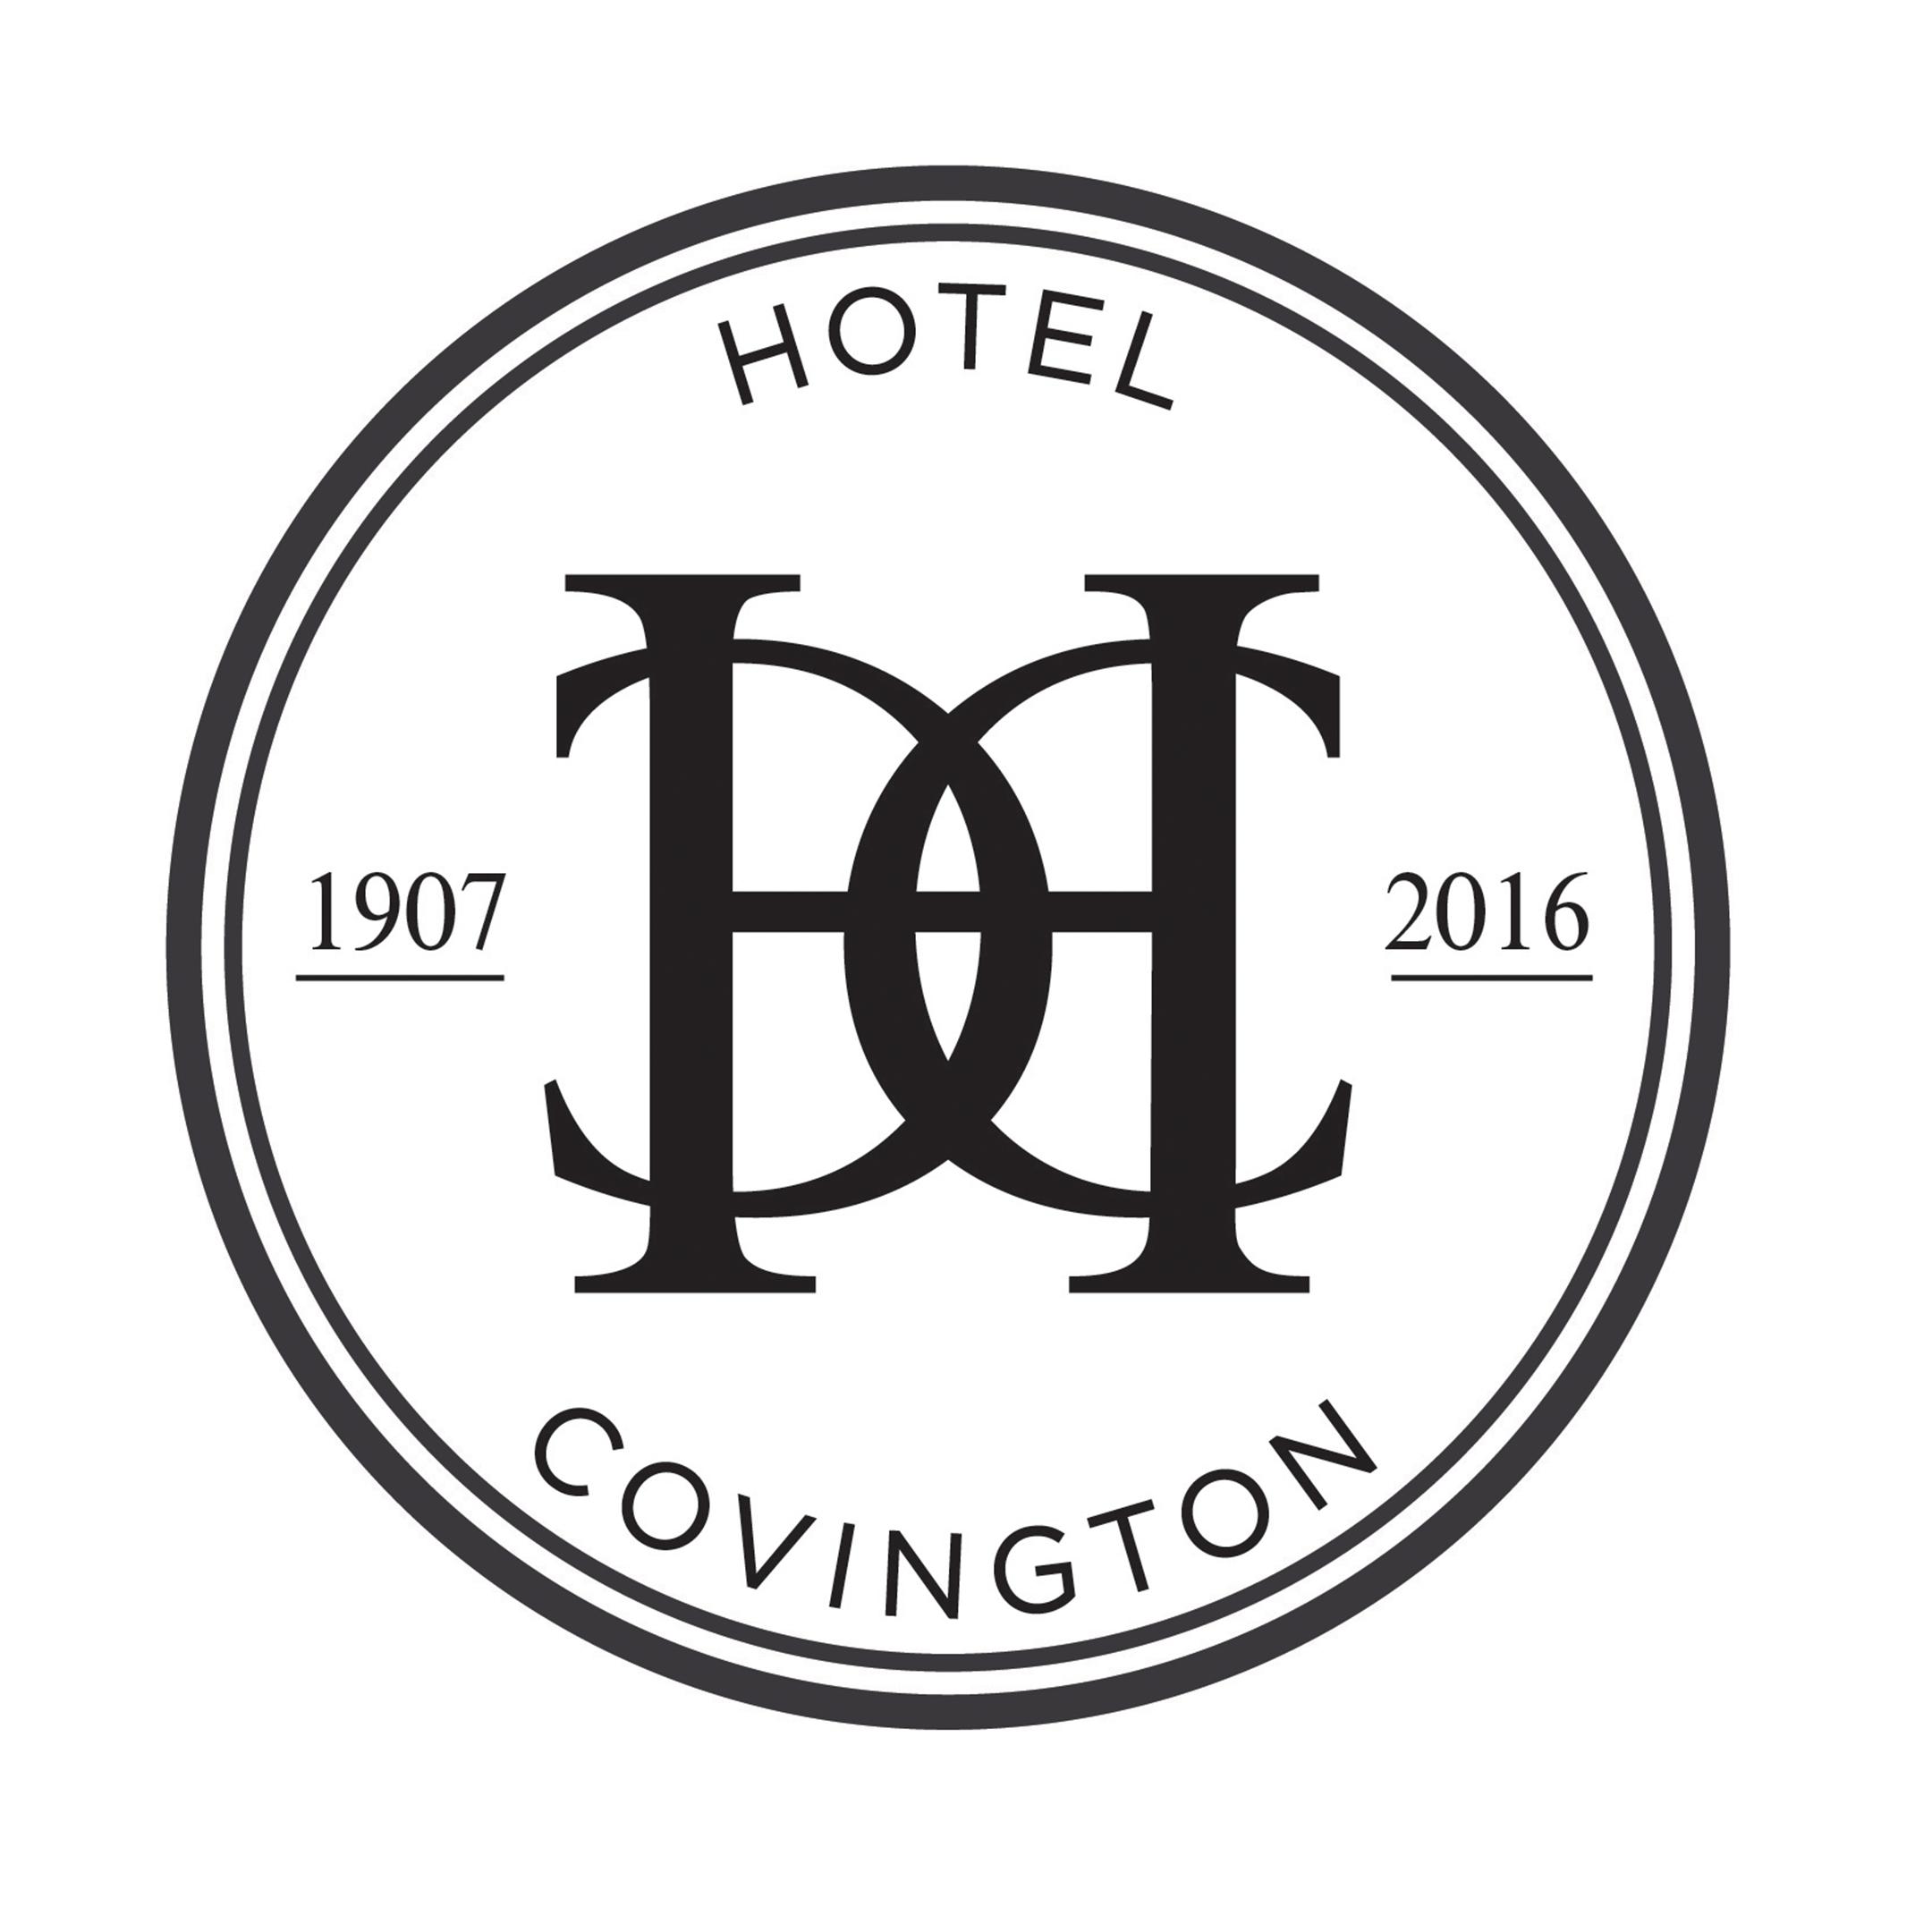 Hotel Covington